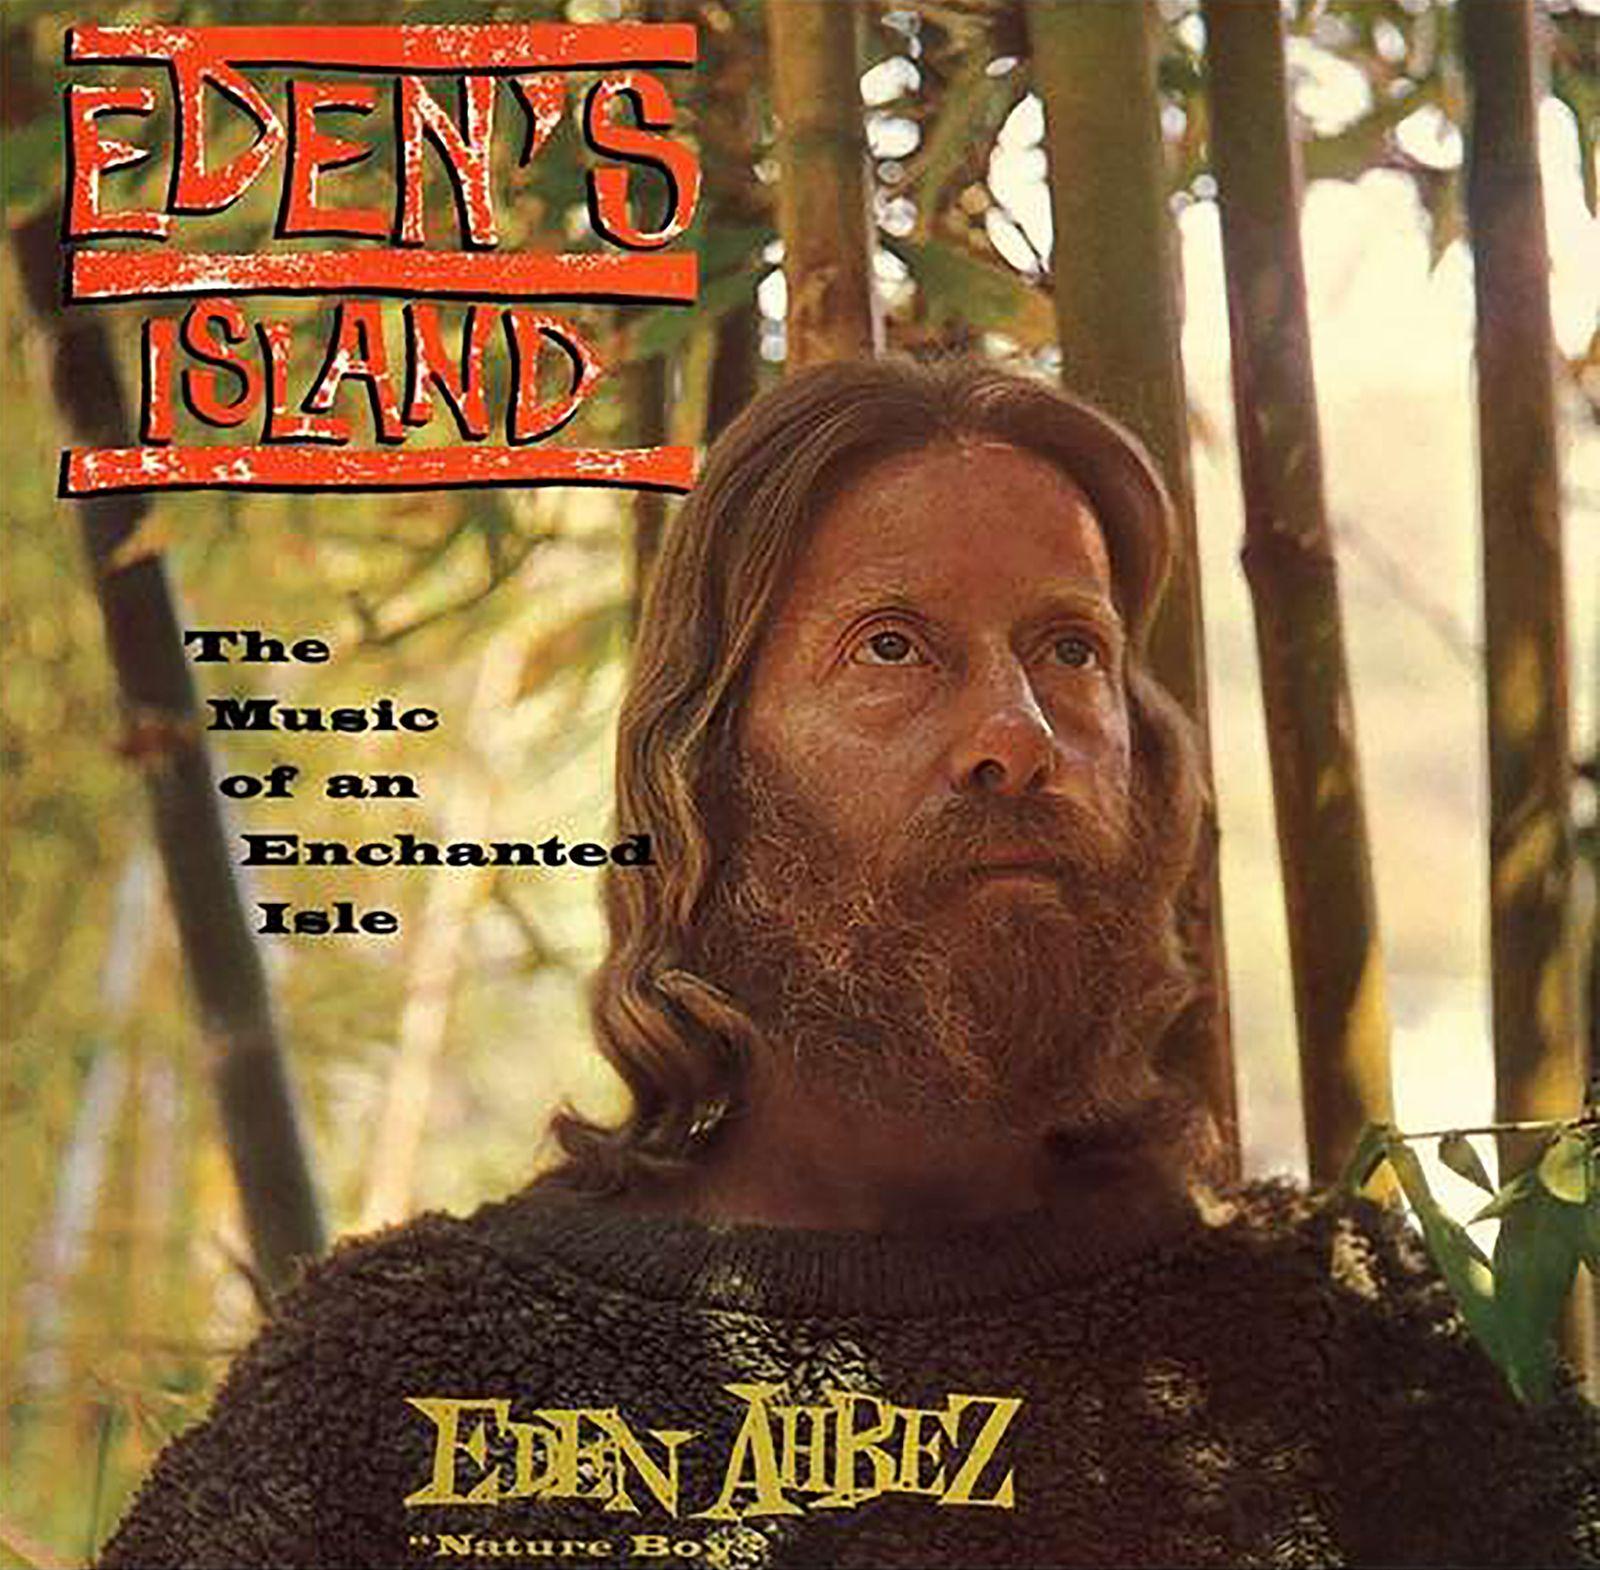 Eden Ahbez - Nature Boy Cover